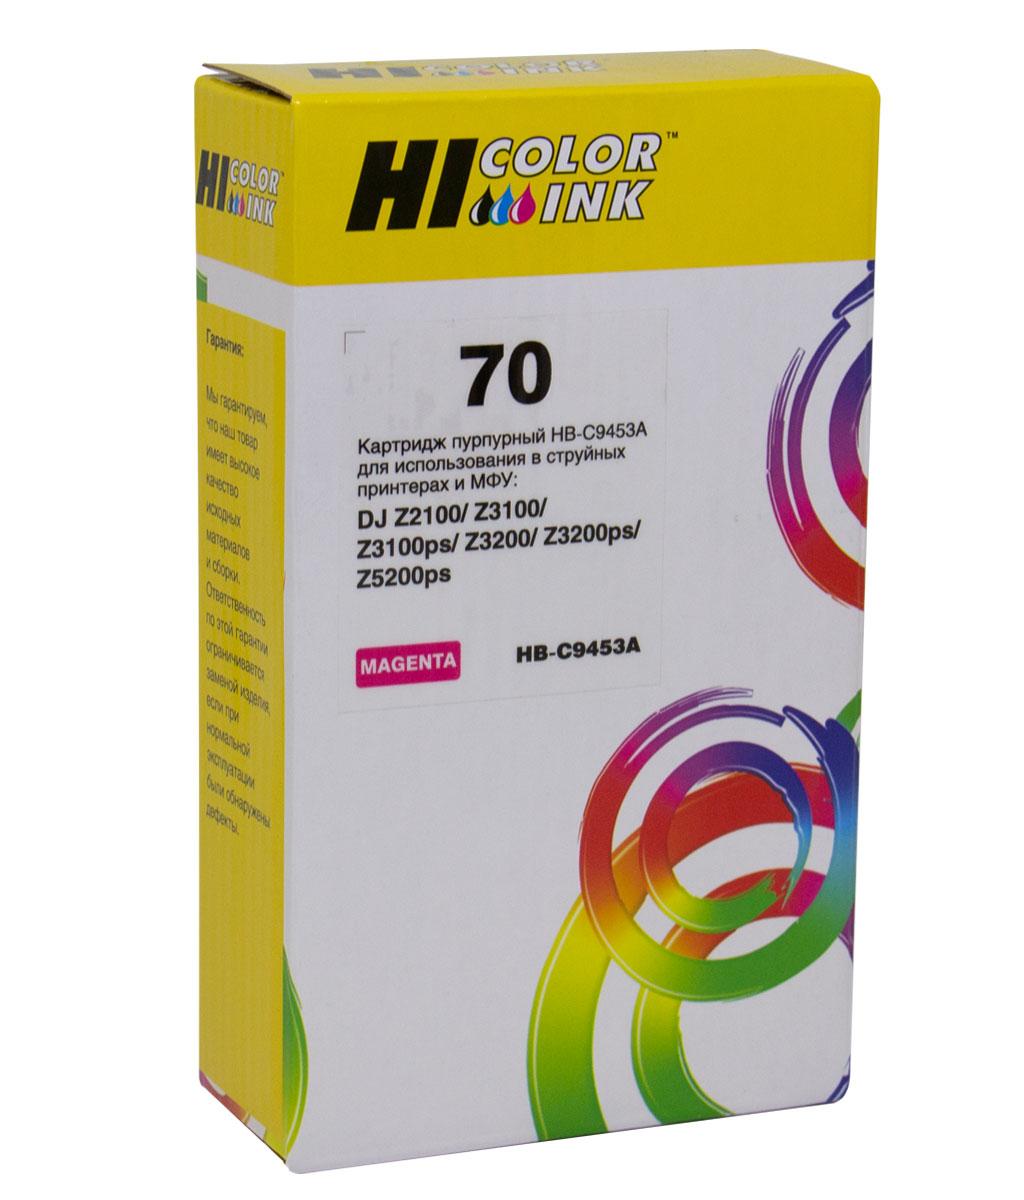 Картридж Hi-Black (HB-C9453A) №70 для HP DesignJet z2100/3100/3200/5200, M